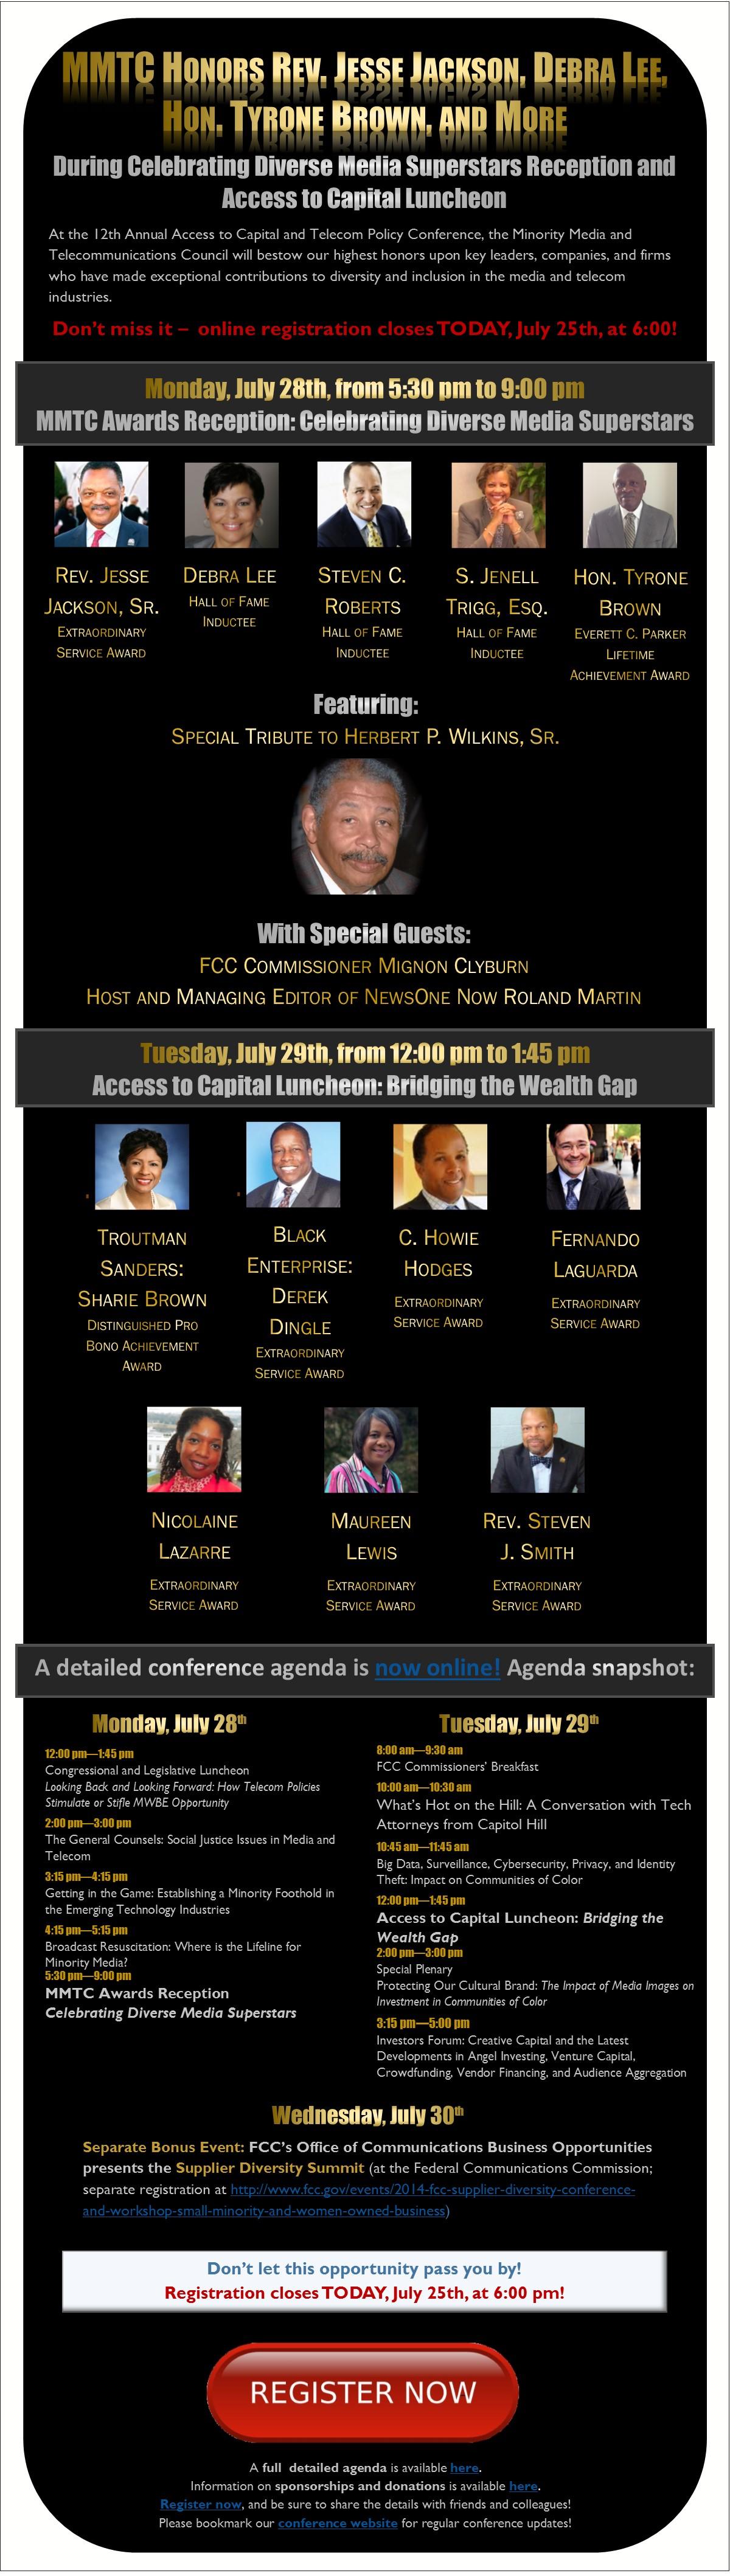 MMTC 2014 Conference Eblast - All Awards w Detailed Agenda